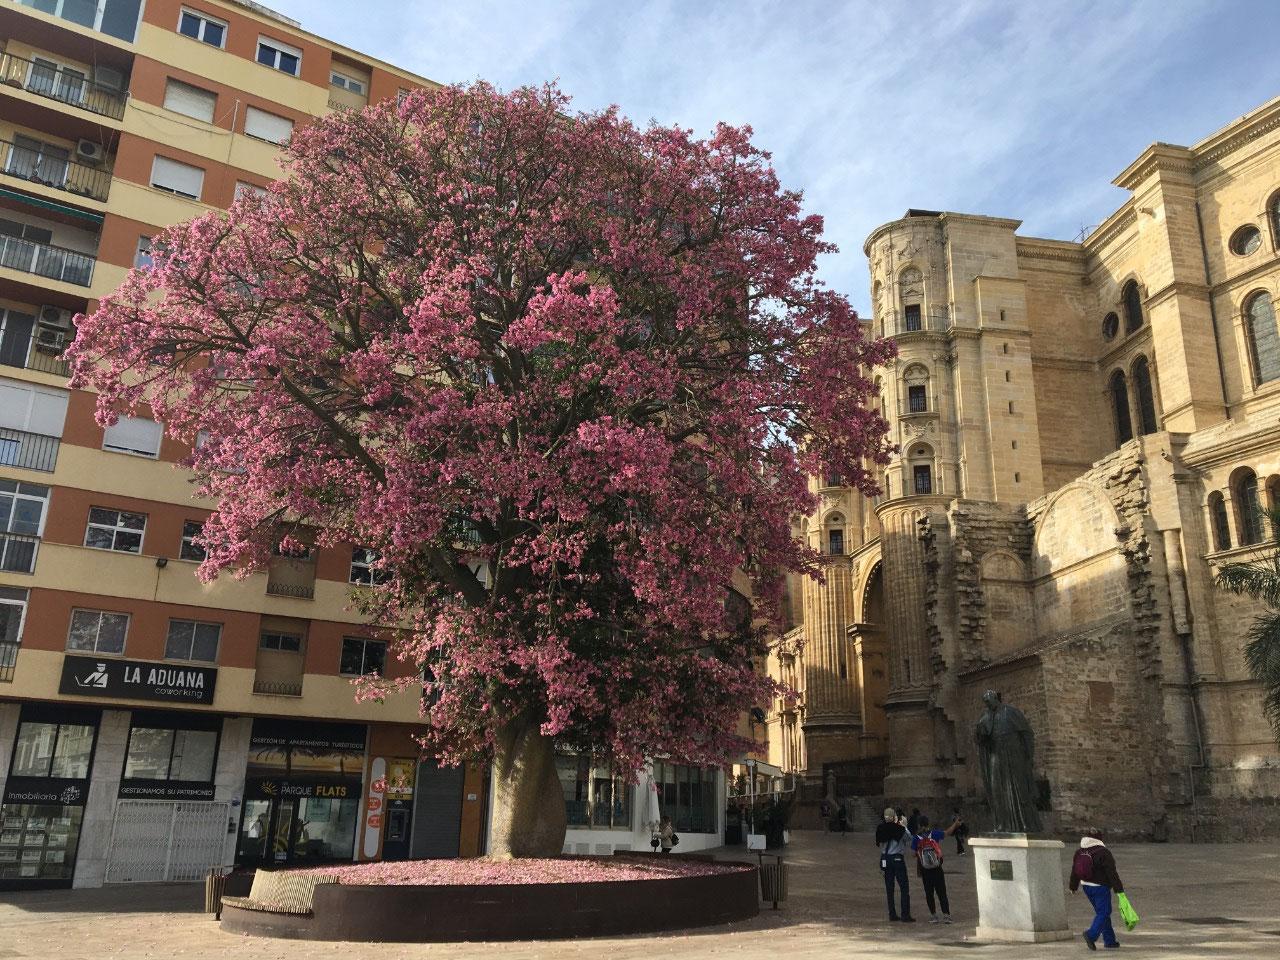 Beautiful tree still in bloom